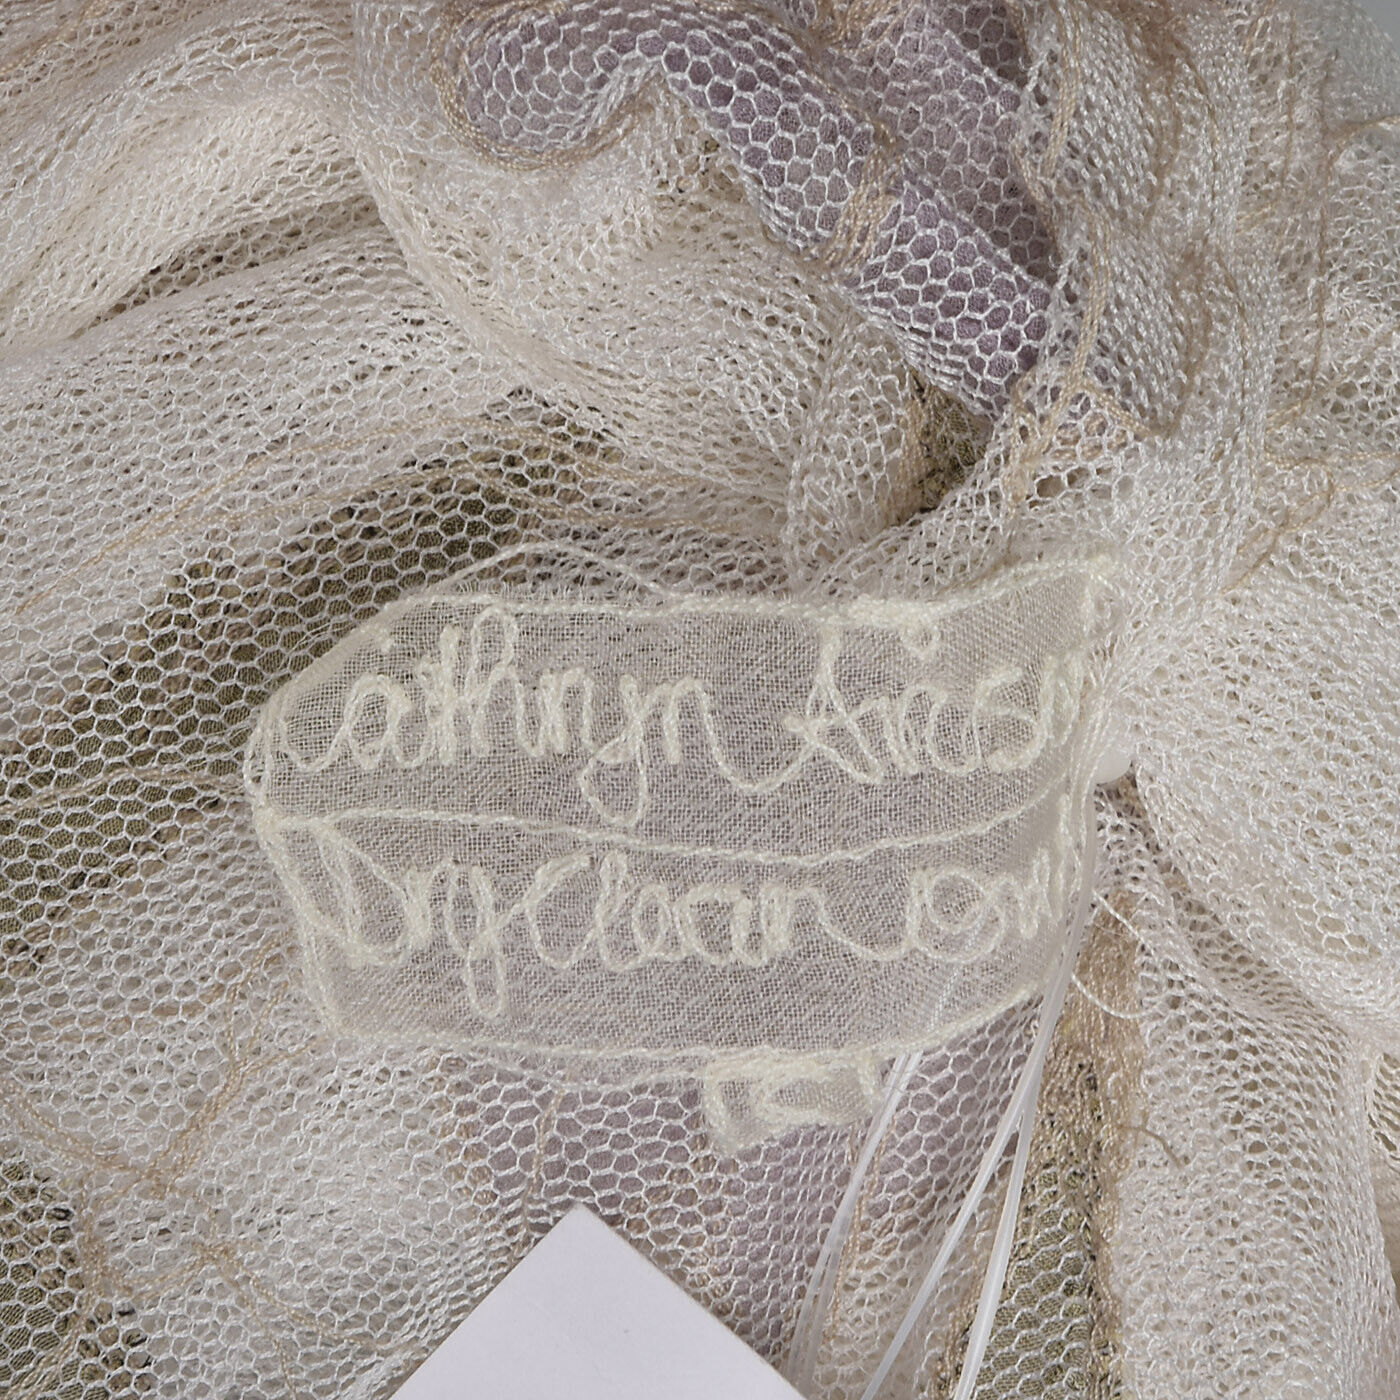 XS Floral Cardigan VTG Cathryn Avison Purple Purple Purple Flower Embroidery Summer Mesh Top 164455